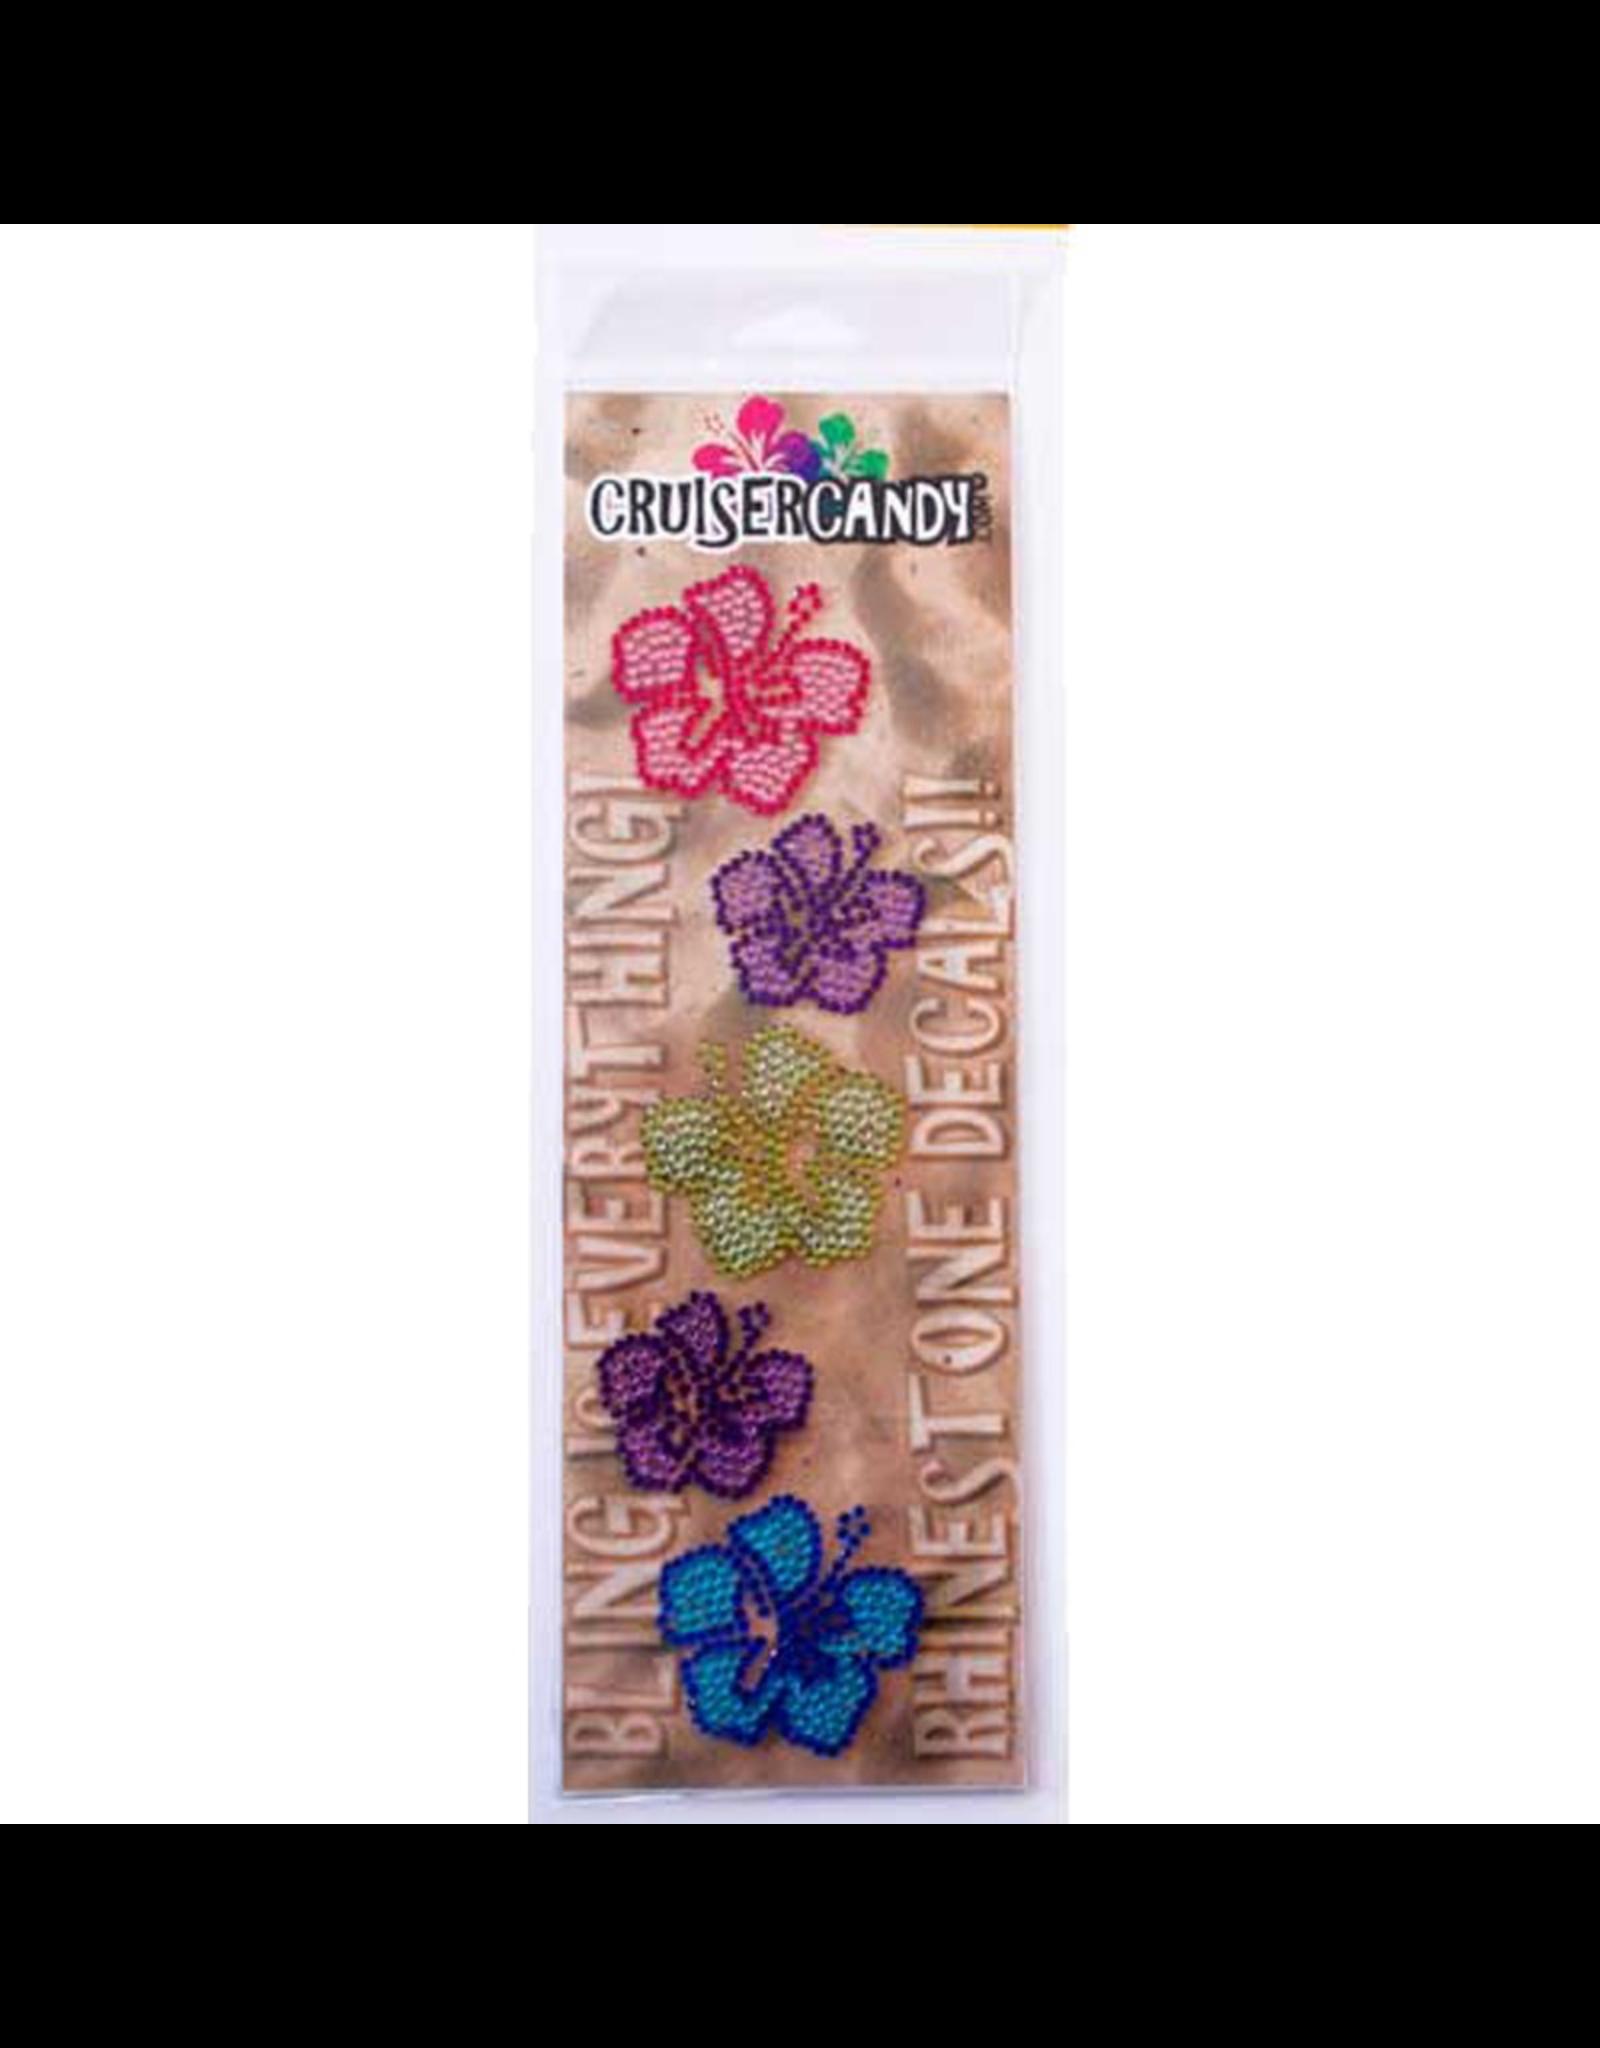 Cruiser Candy Cruiser Candy Decals